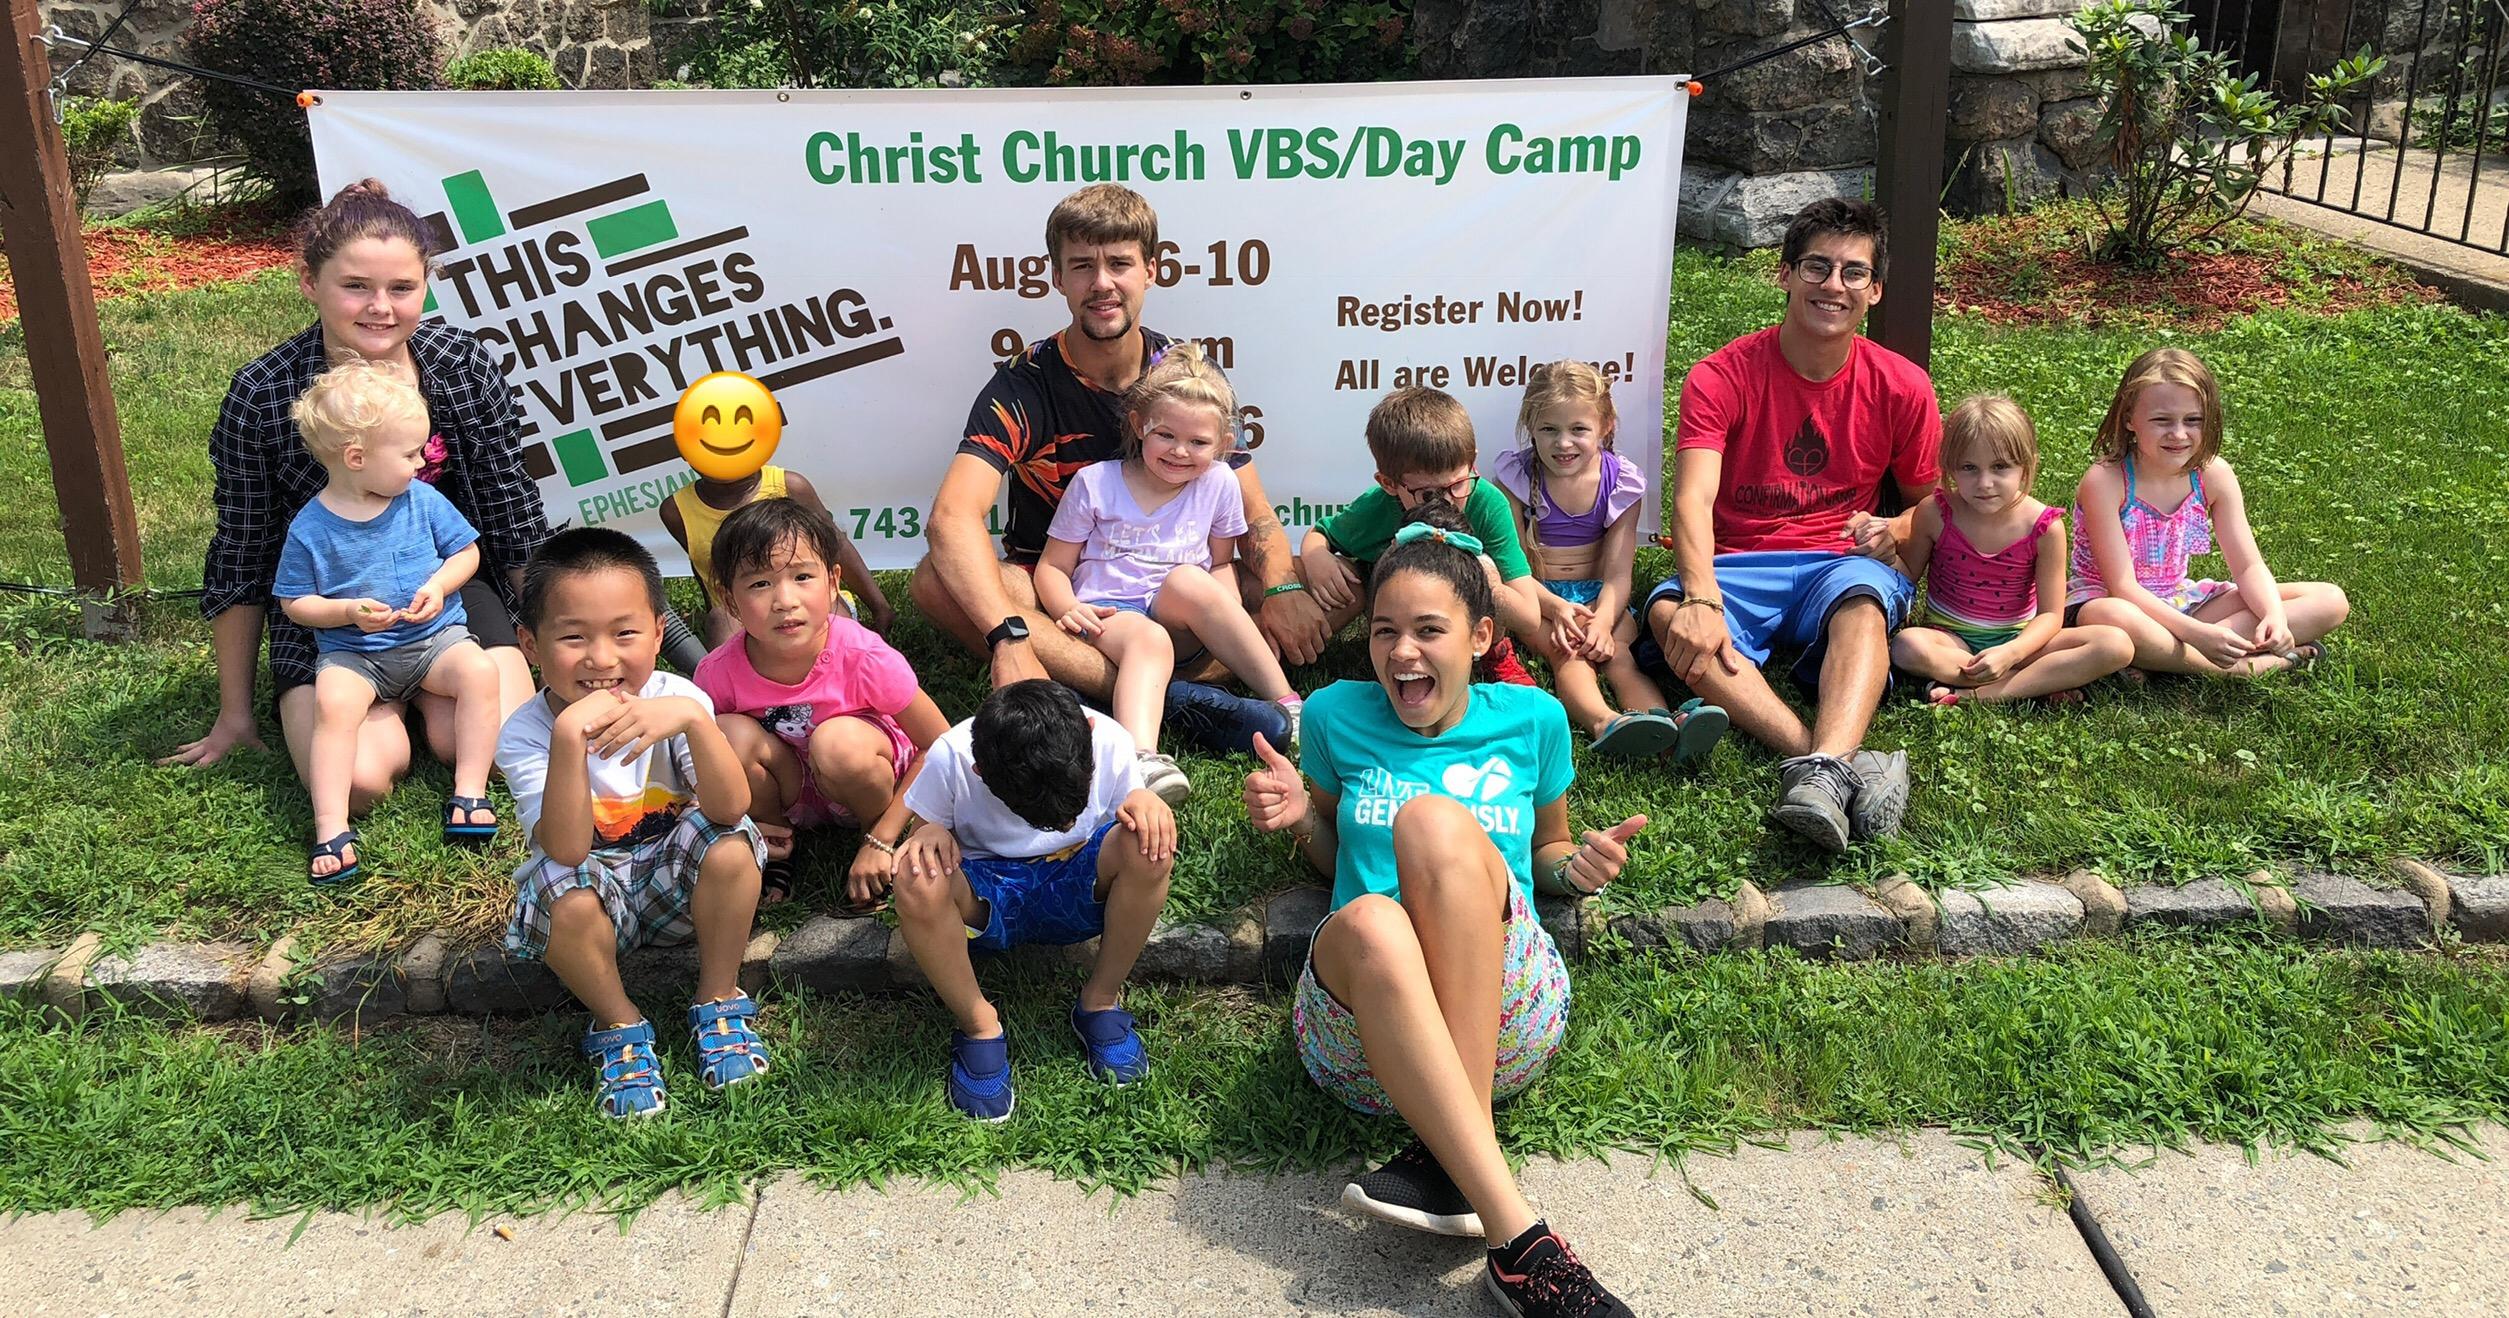 Christ Church Day Camp